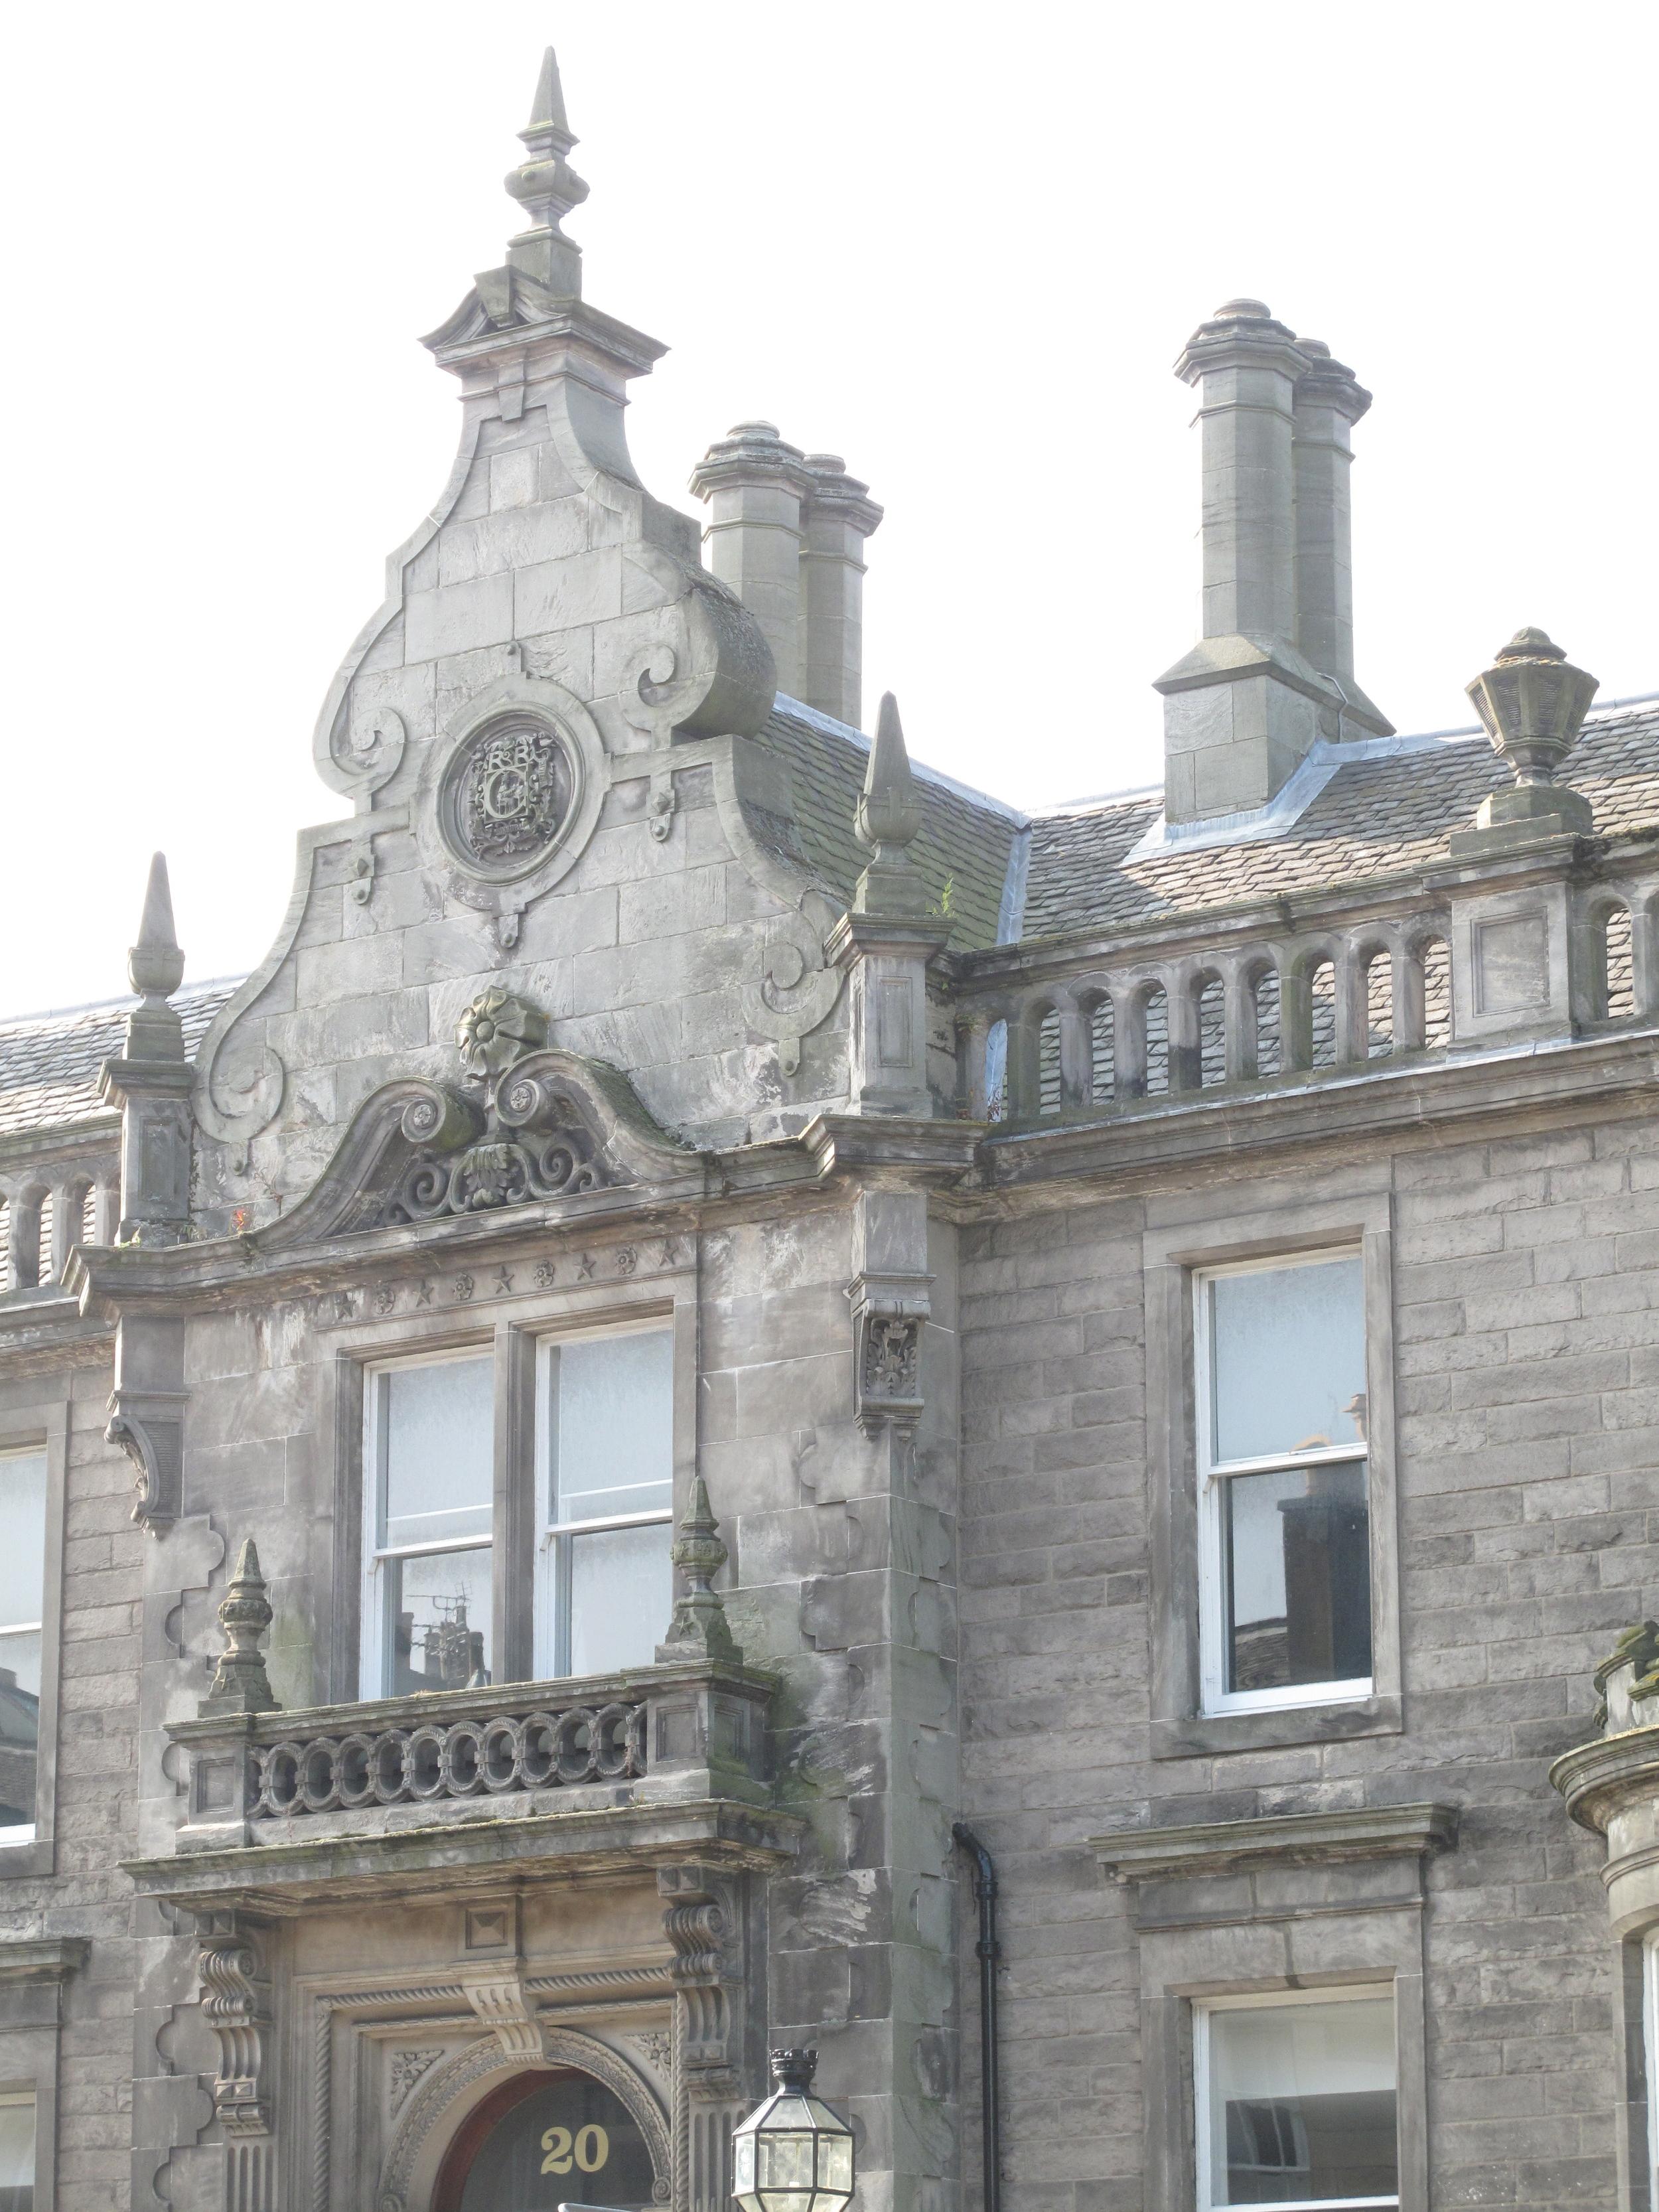 Edinburgh stone architecture.